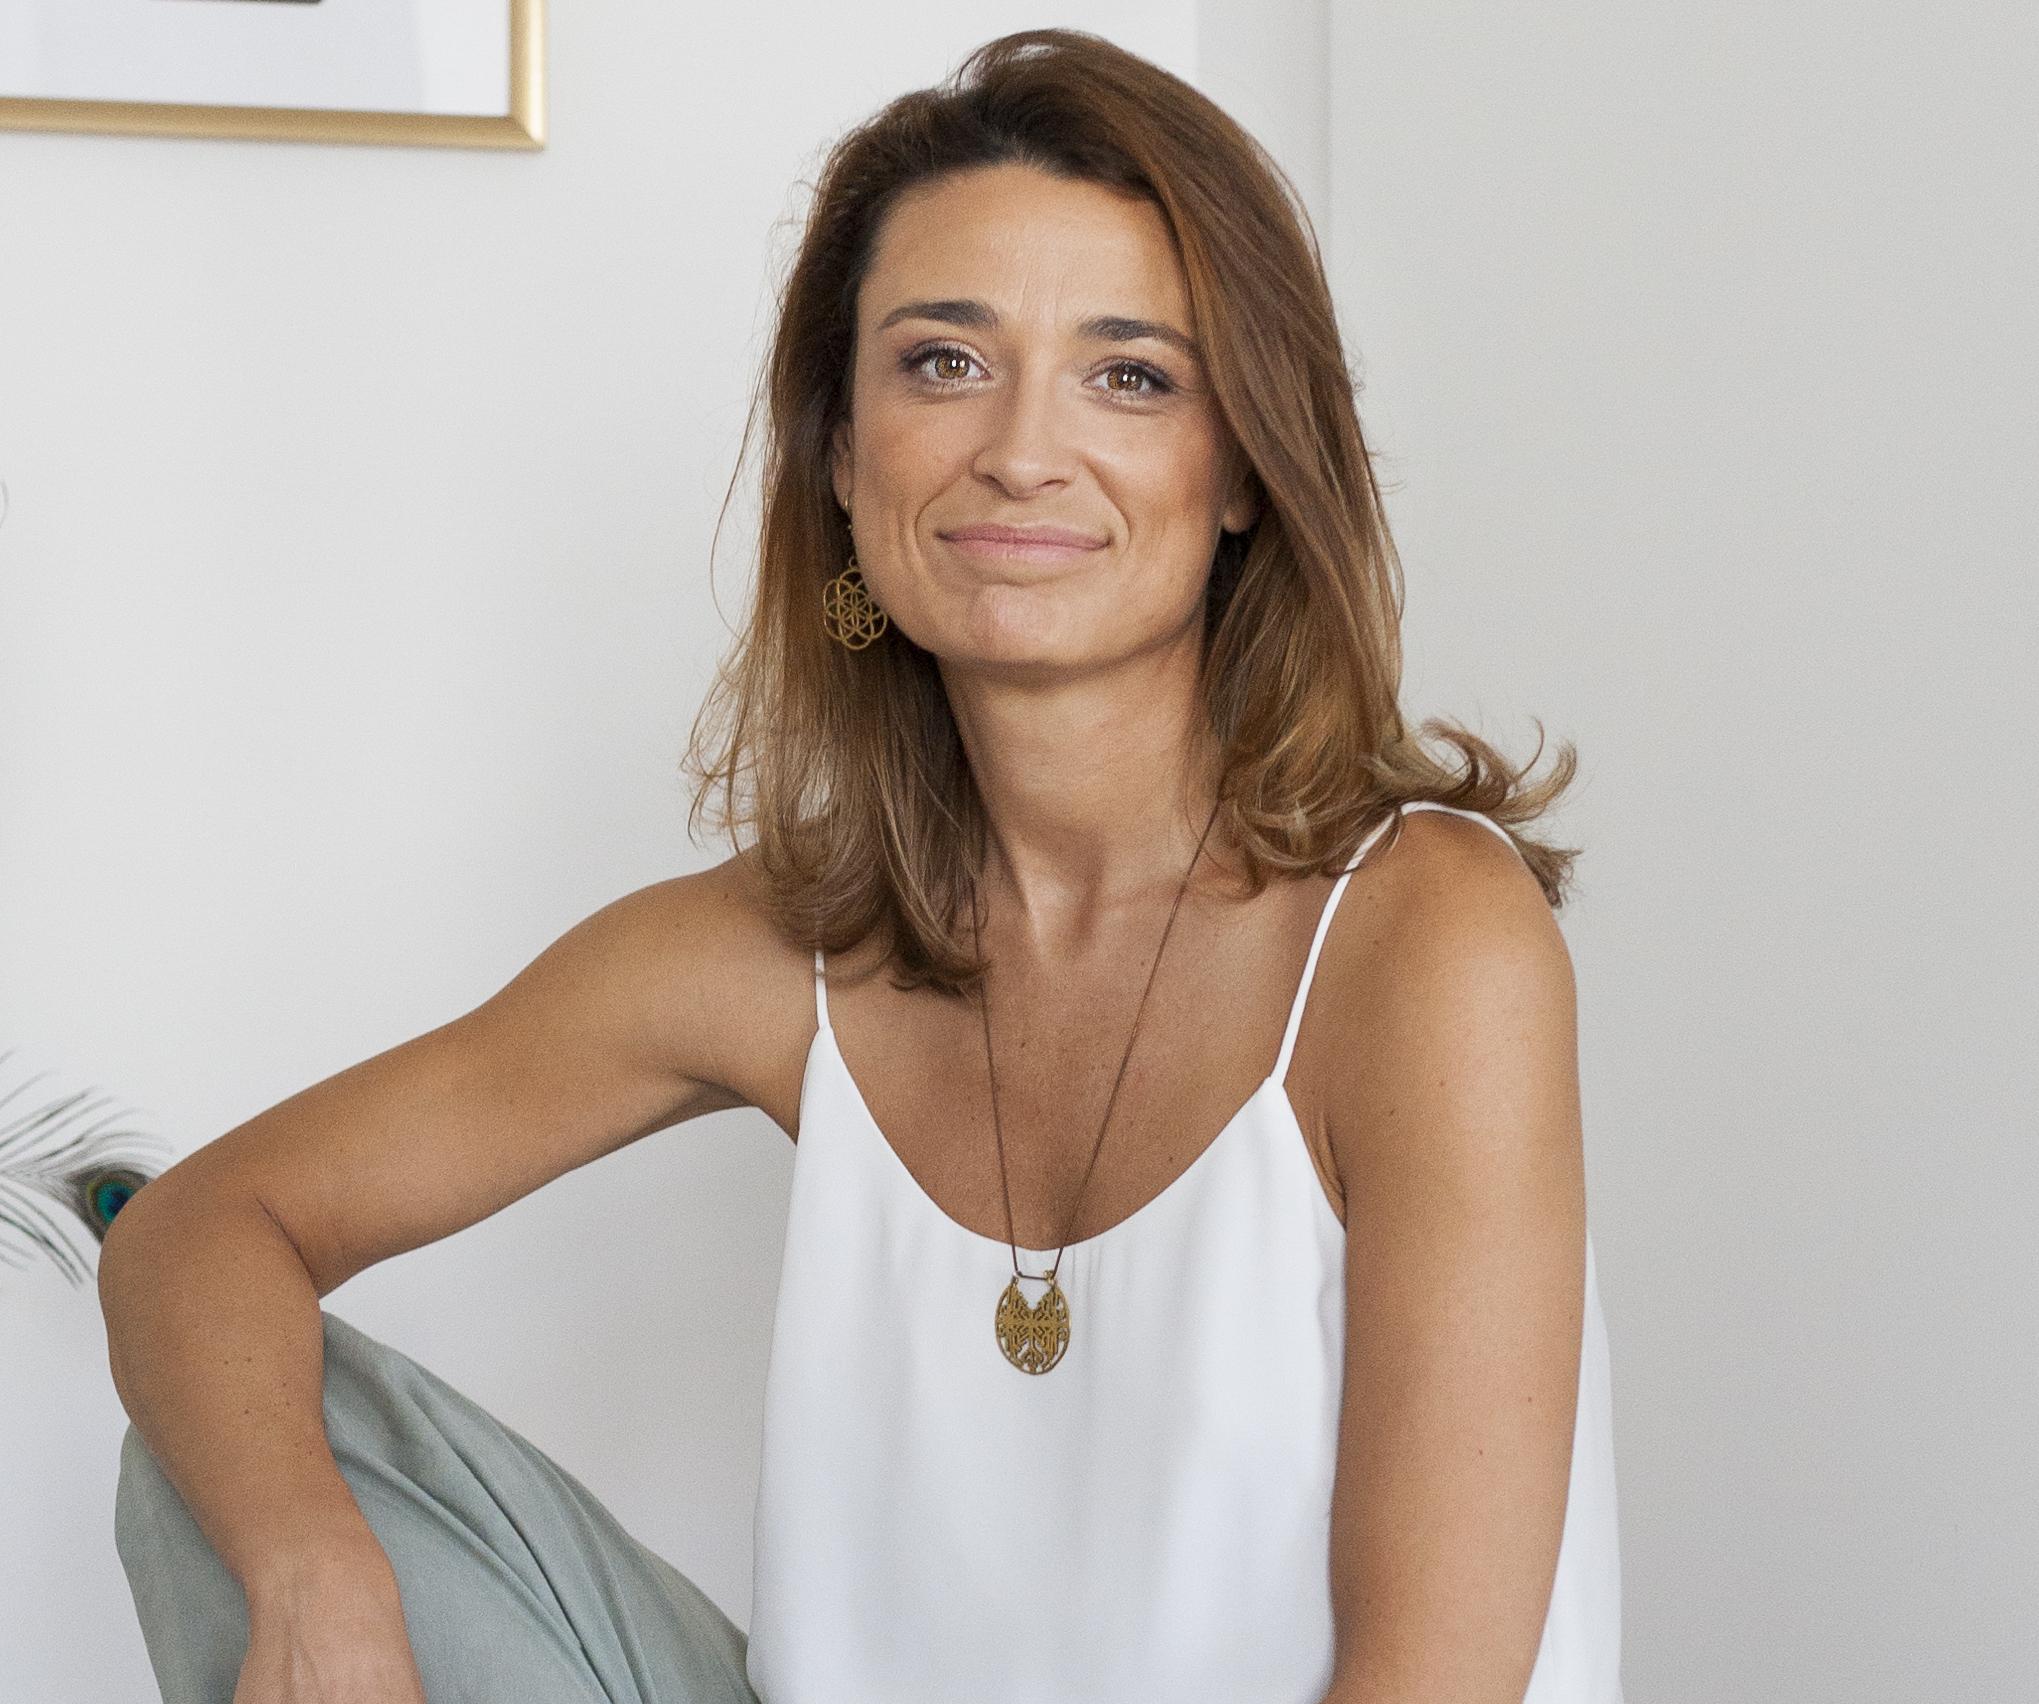 Korina Hortynska